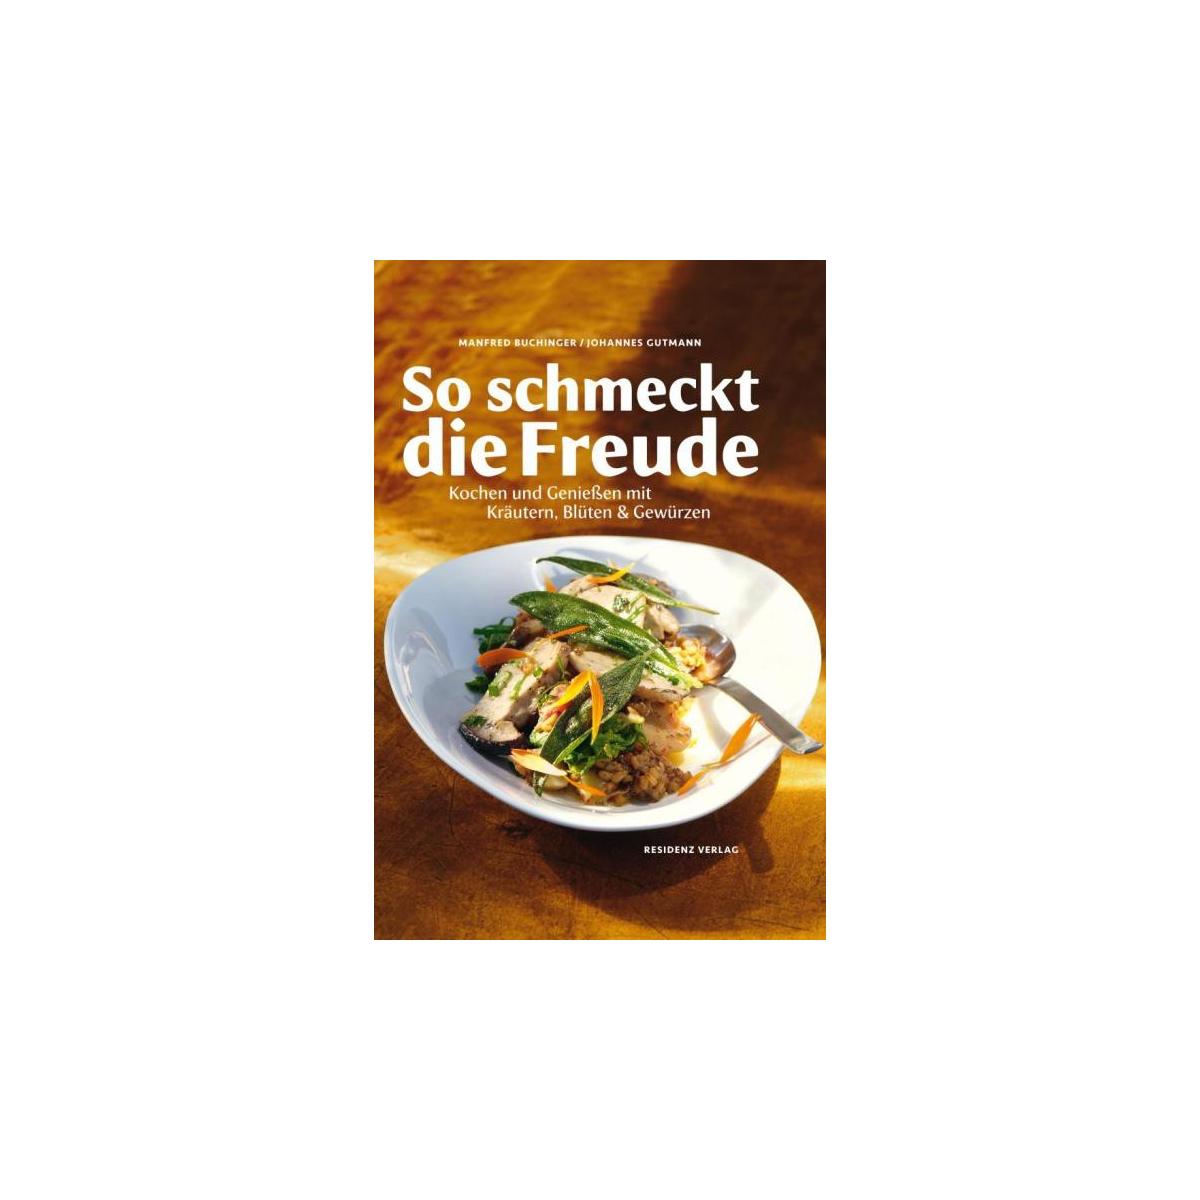 Kochbuch So schmeckt die Freude